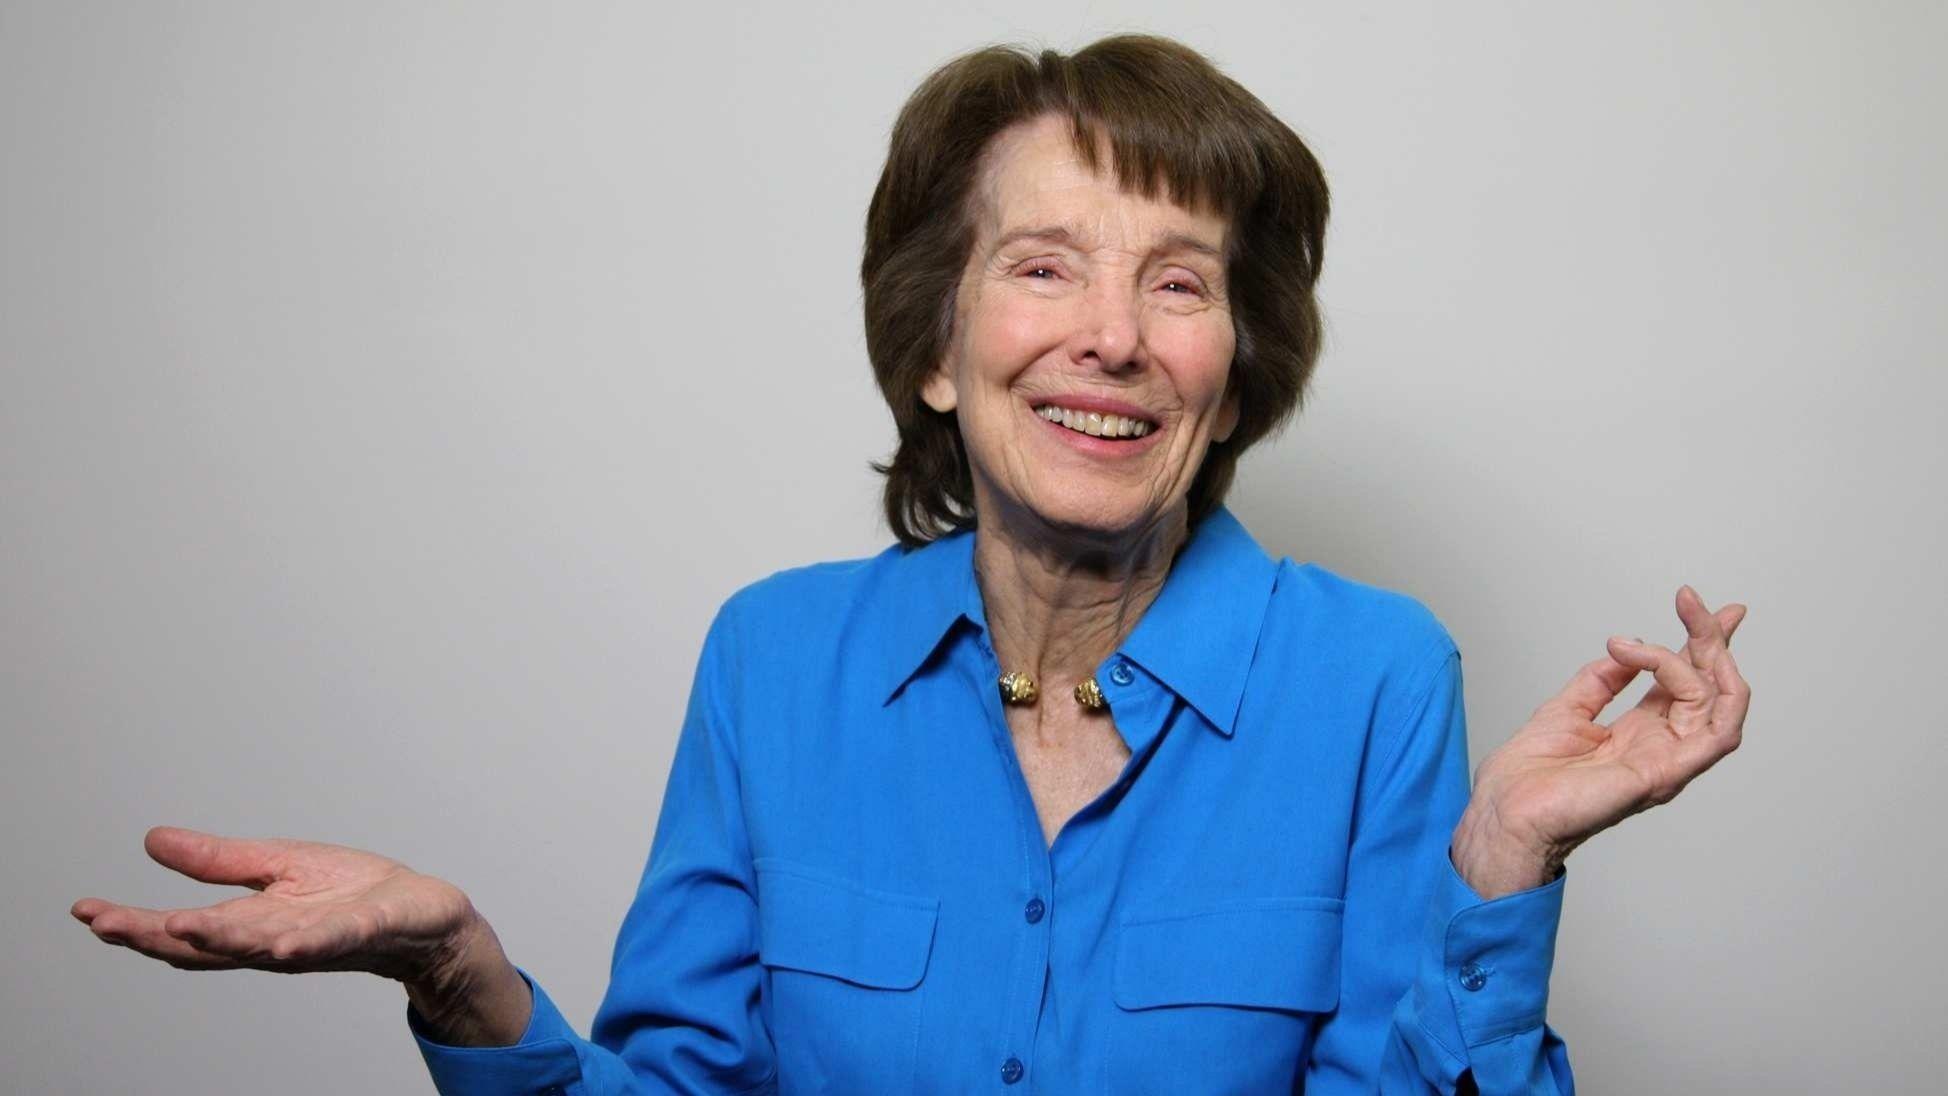 Julie Adams, 'Creature From the Black Lagoon' Star, dies at 92